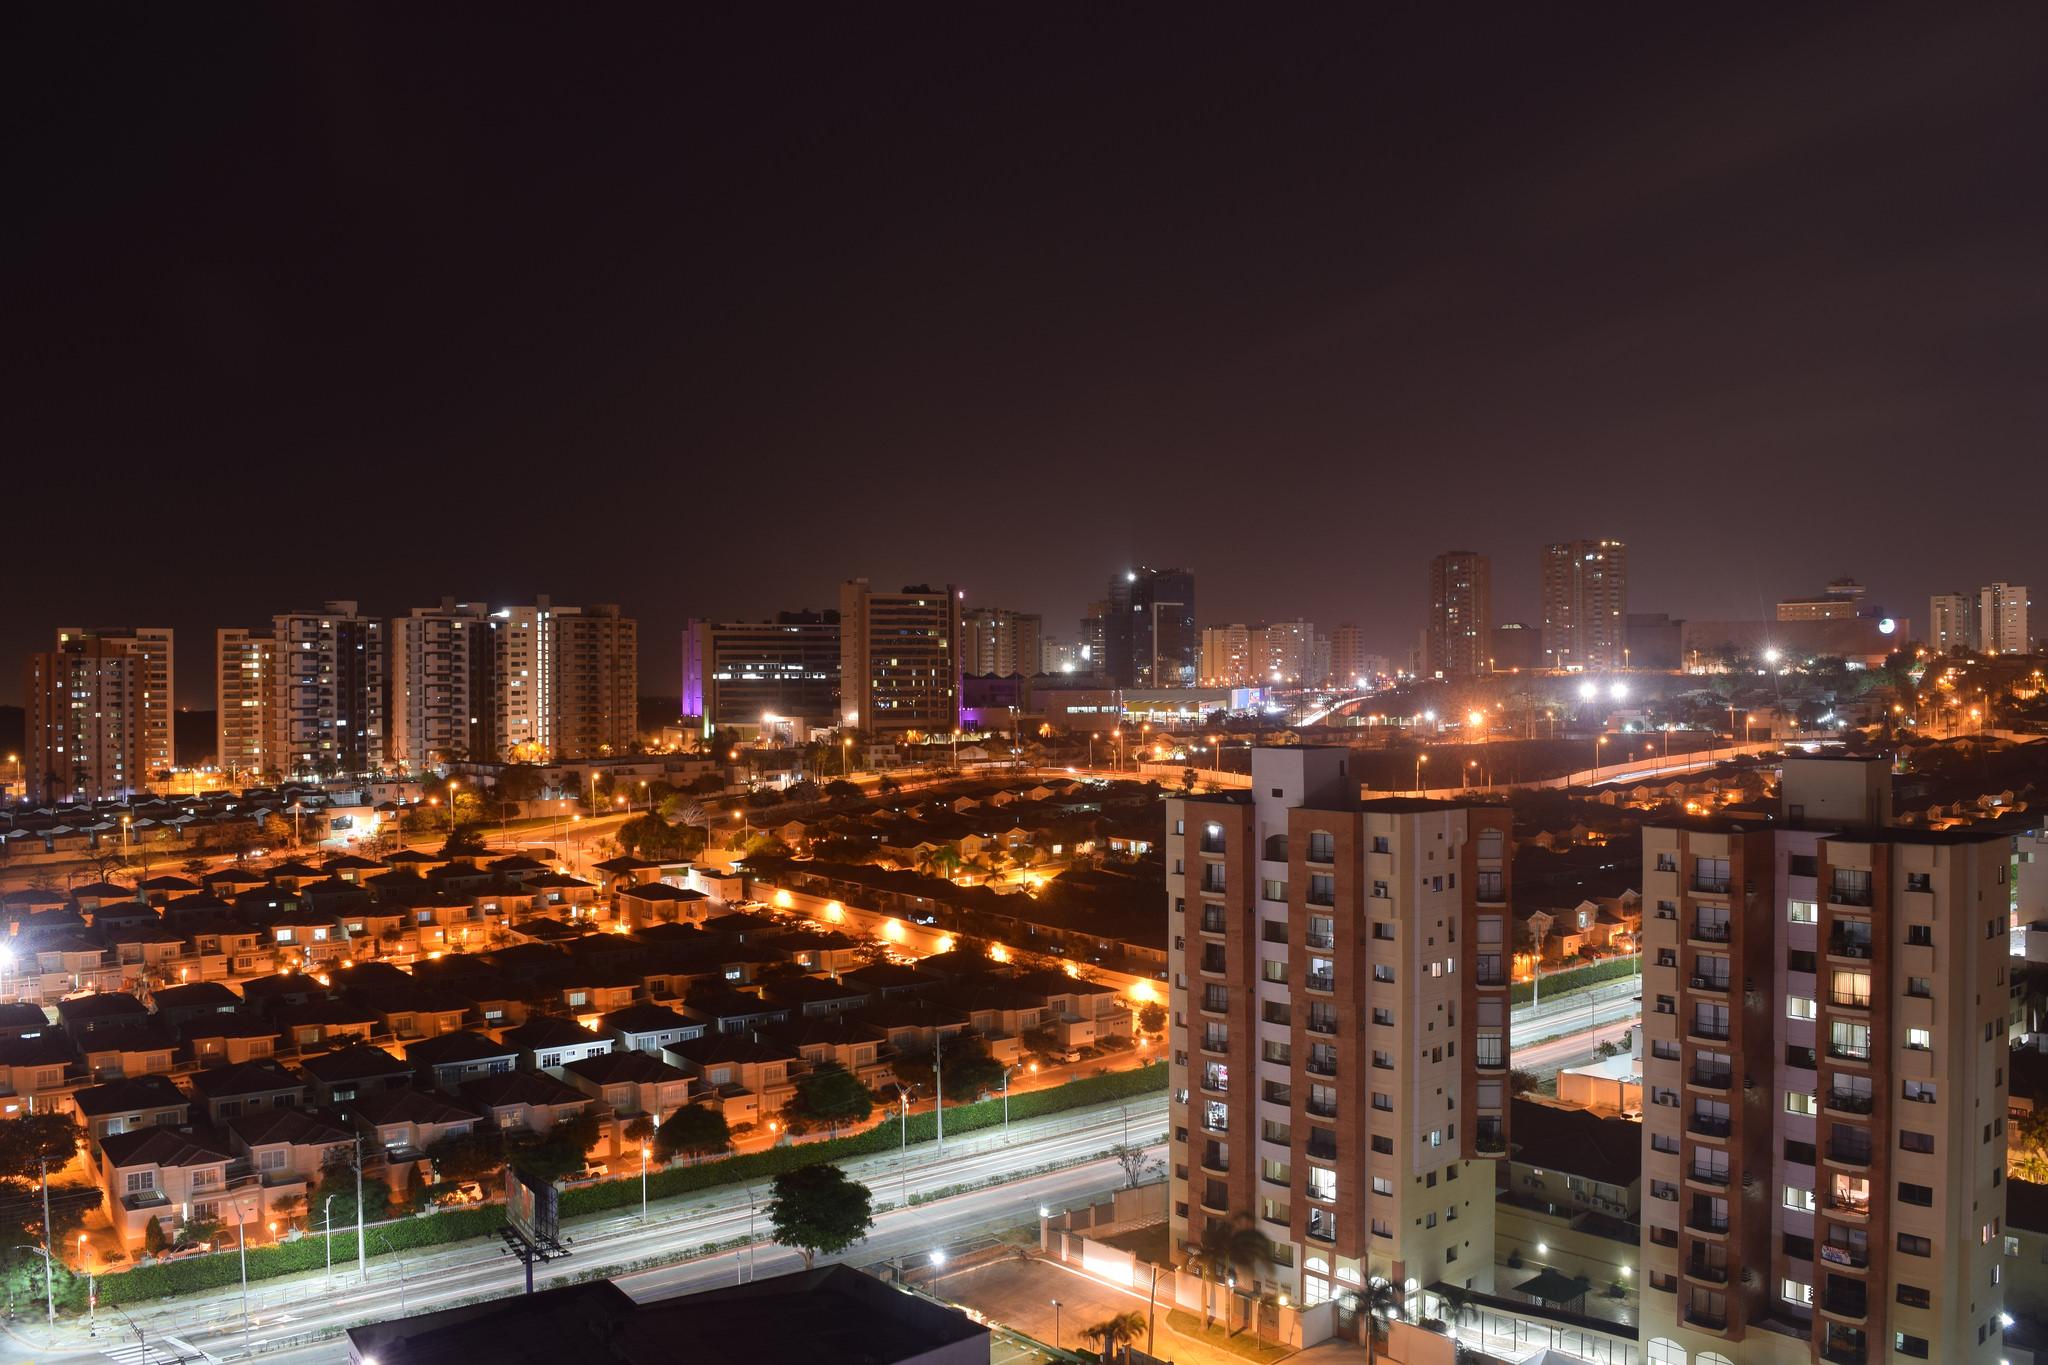 Foto: Daniel Cardona. Licencia Creative Commons CC BY-NC-SA 2.0. Extraída de: Flickr.